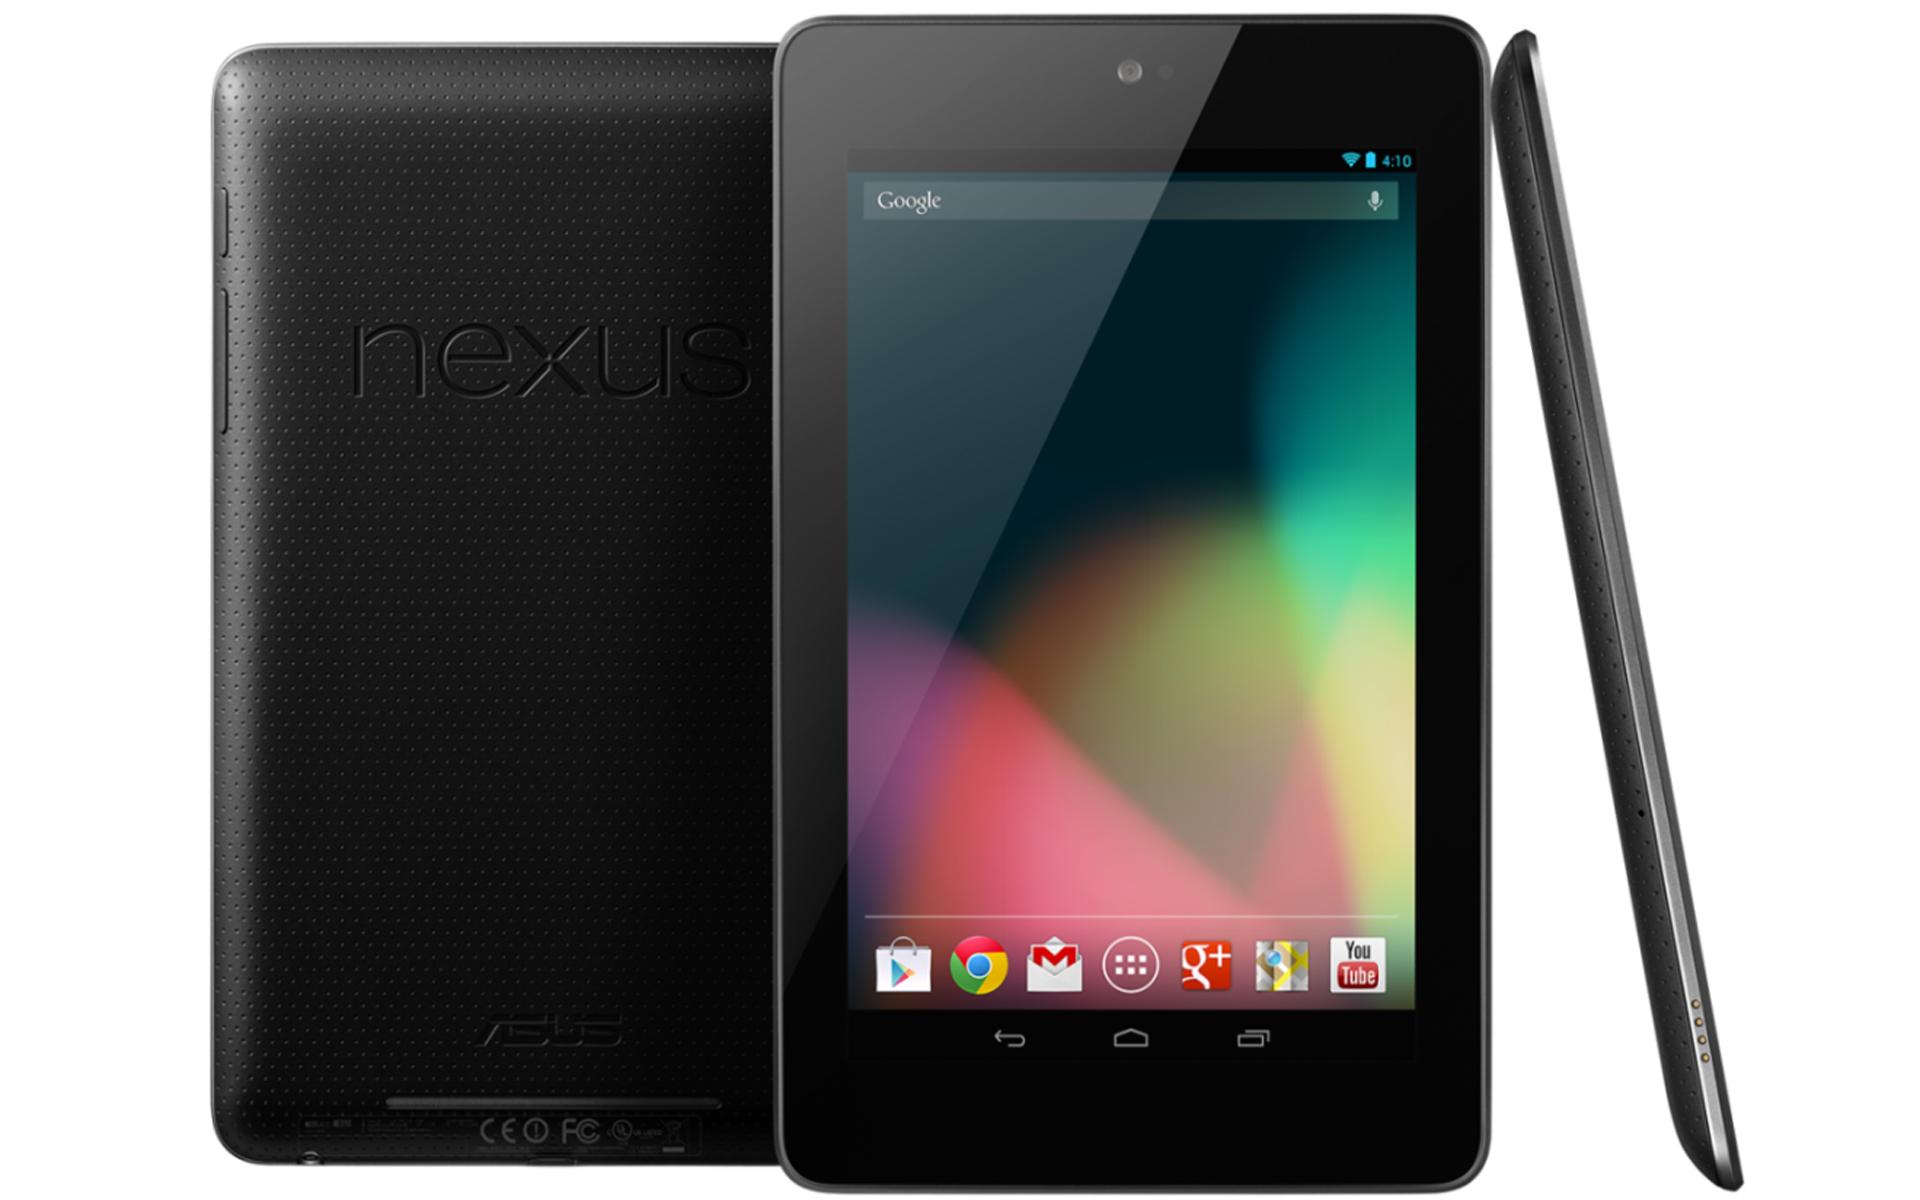 Tablet Nexus 7 HD Wallpaper HD Desktop Wallpaper 1920x1200